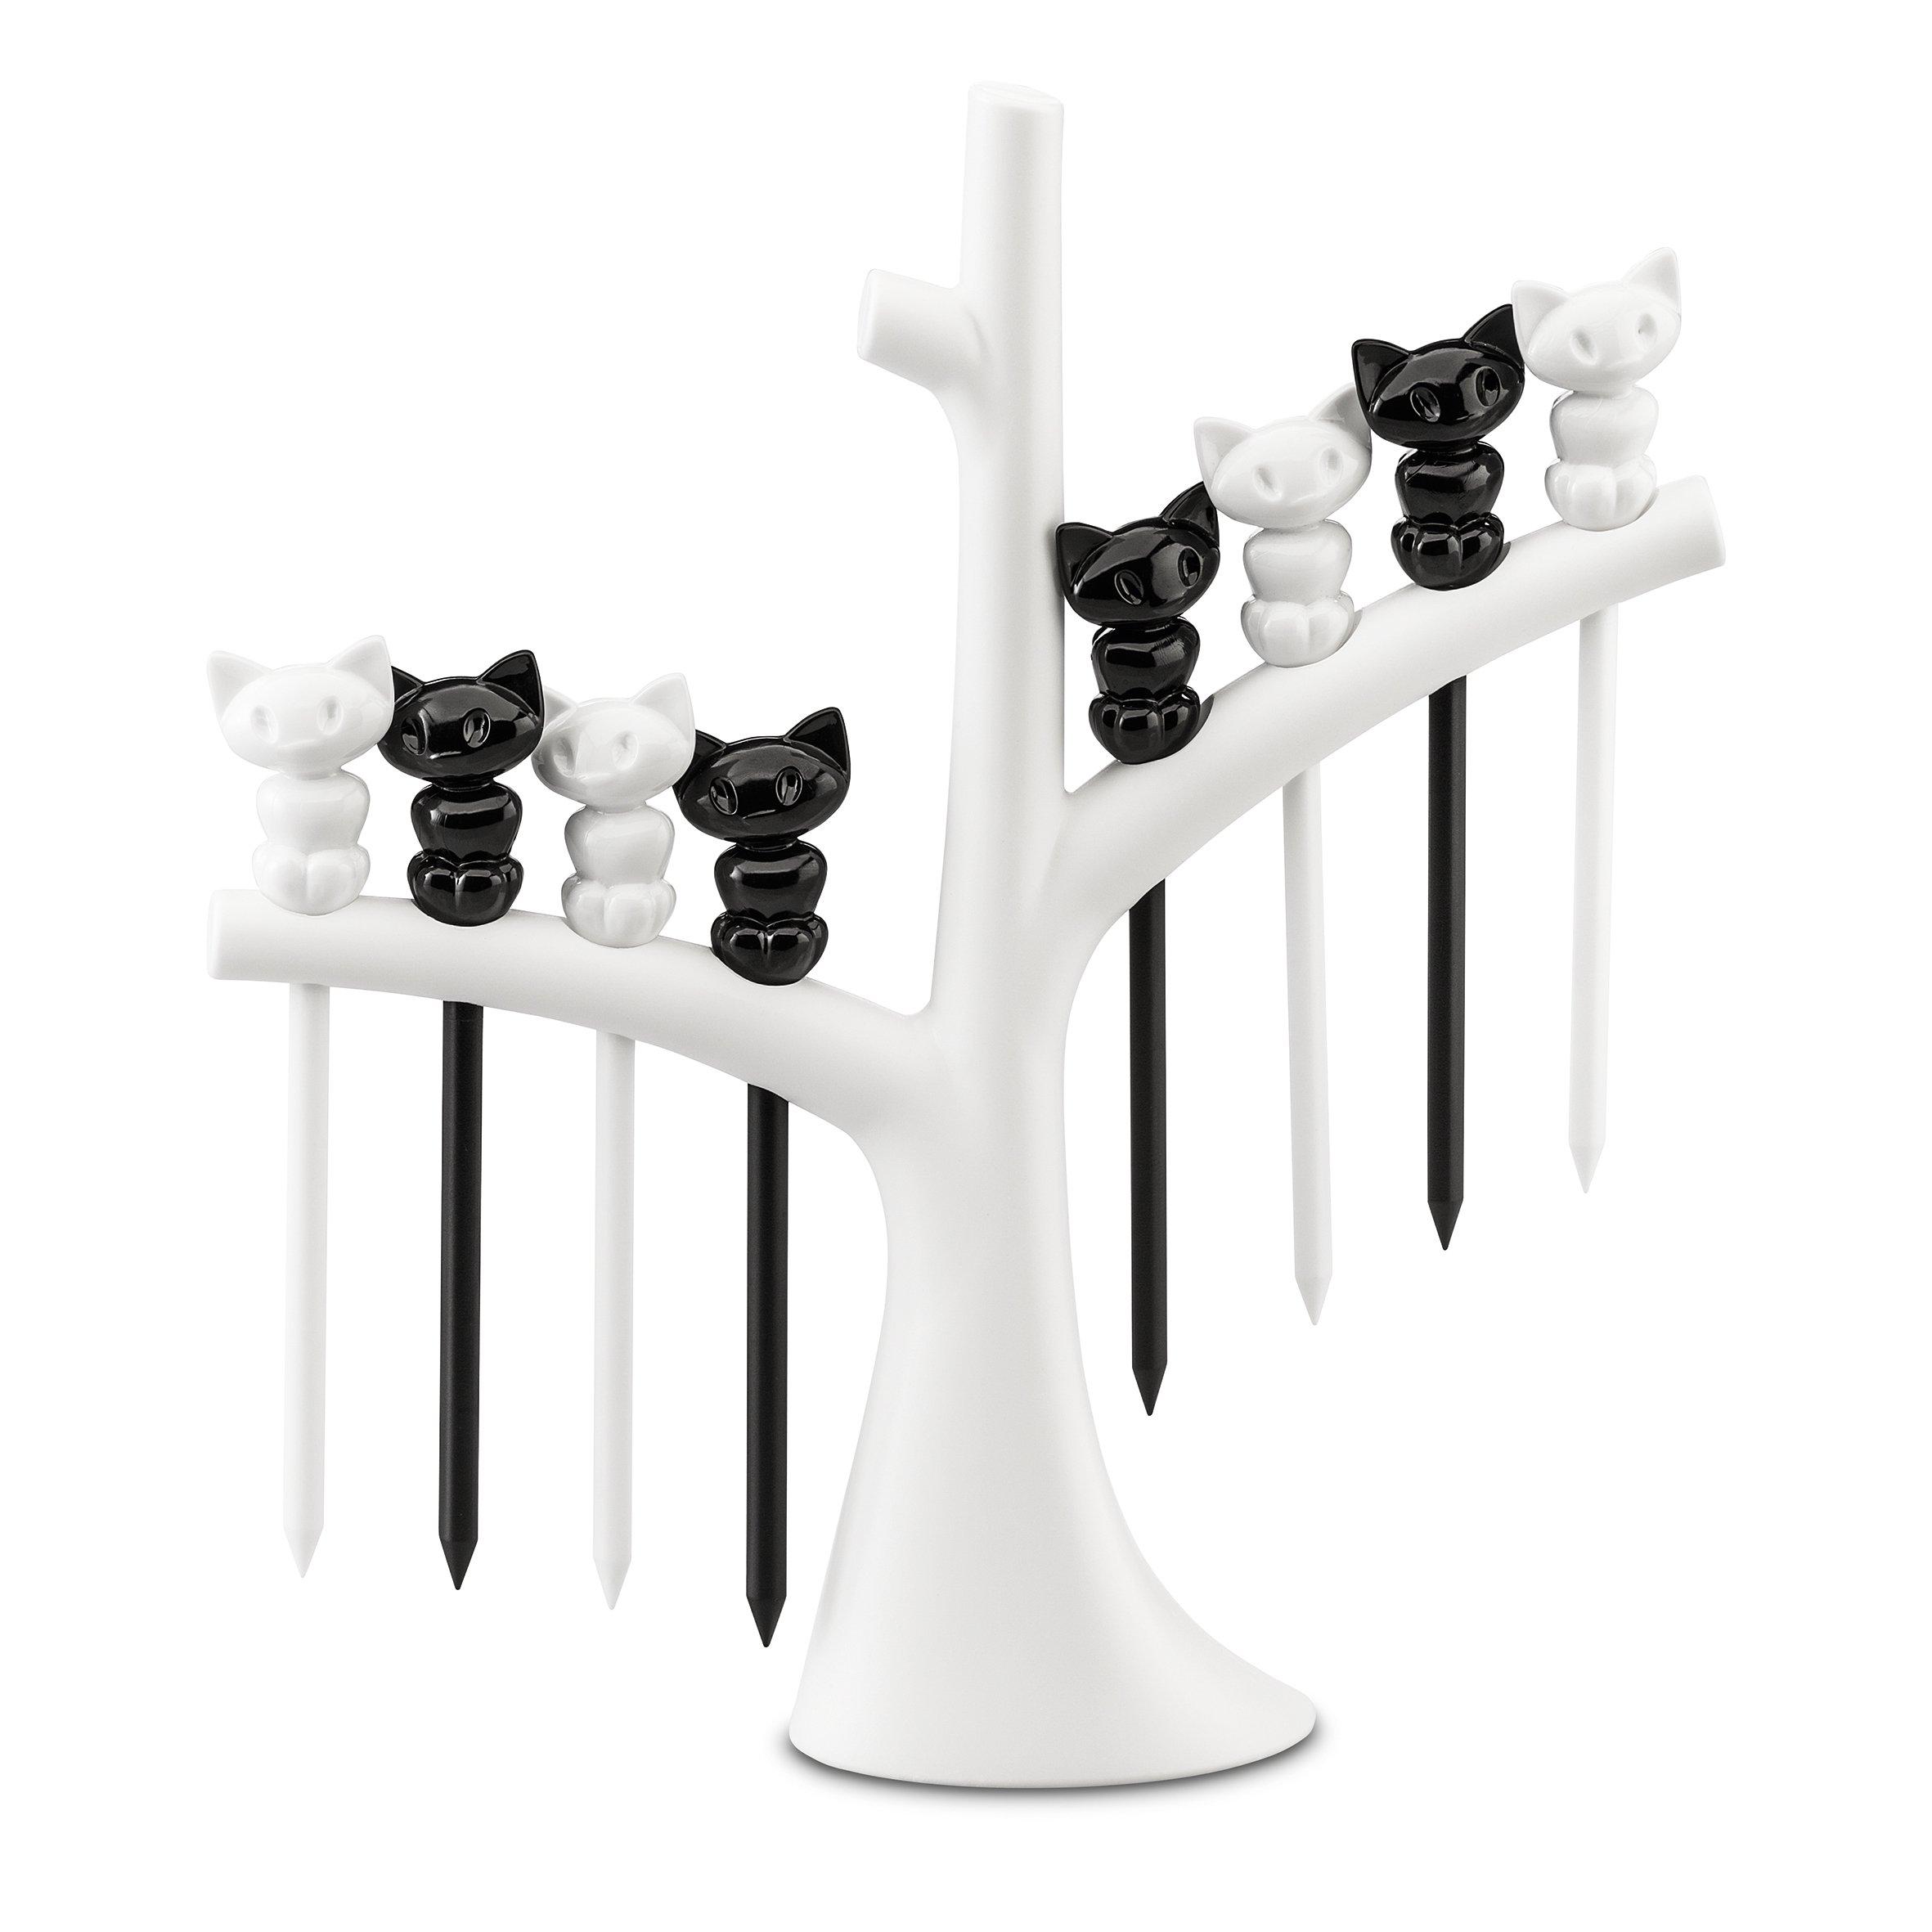 Koziol 3134417 Miaou Hors d'Oeuvres Forks, One Size, cotton white-cosmos black/cotton white